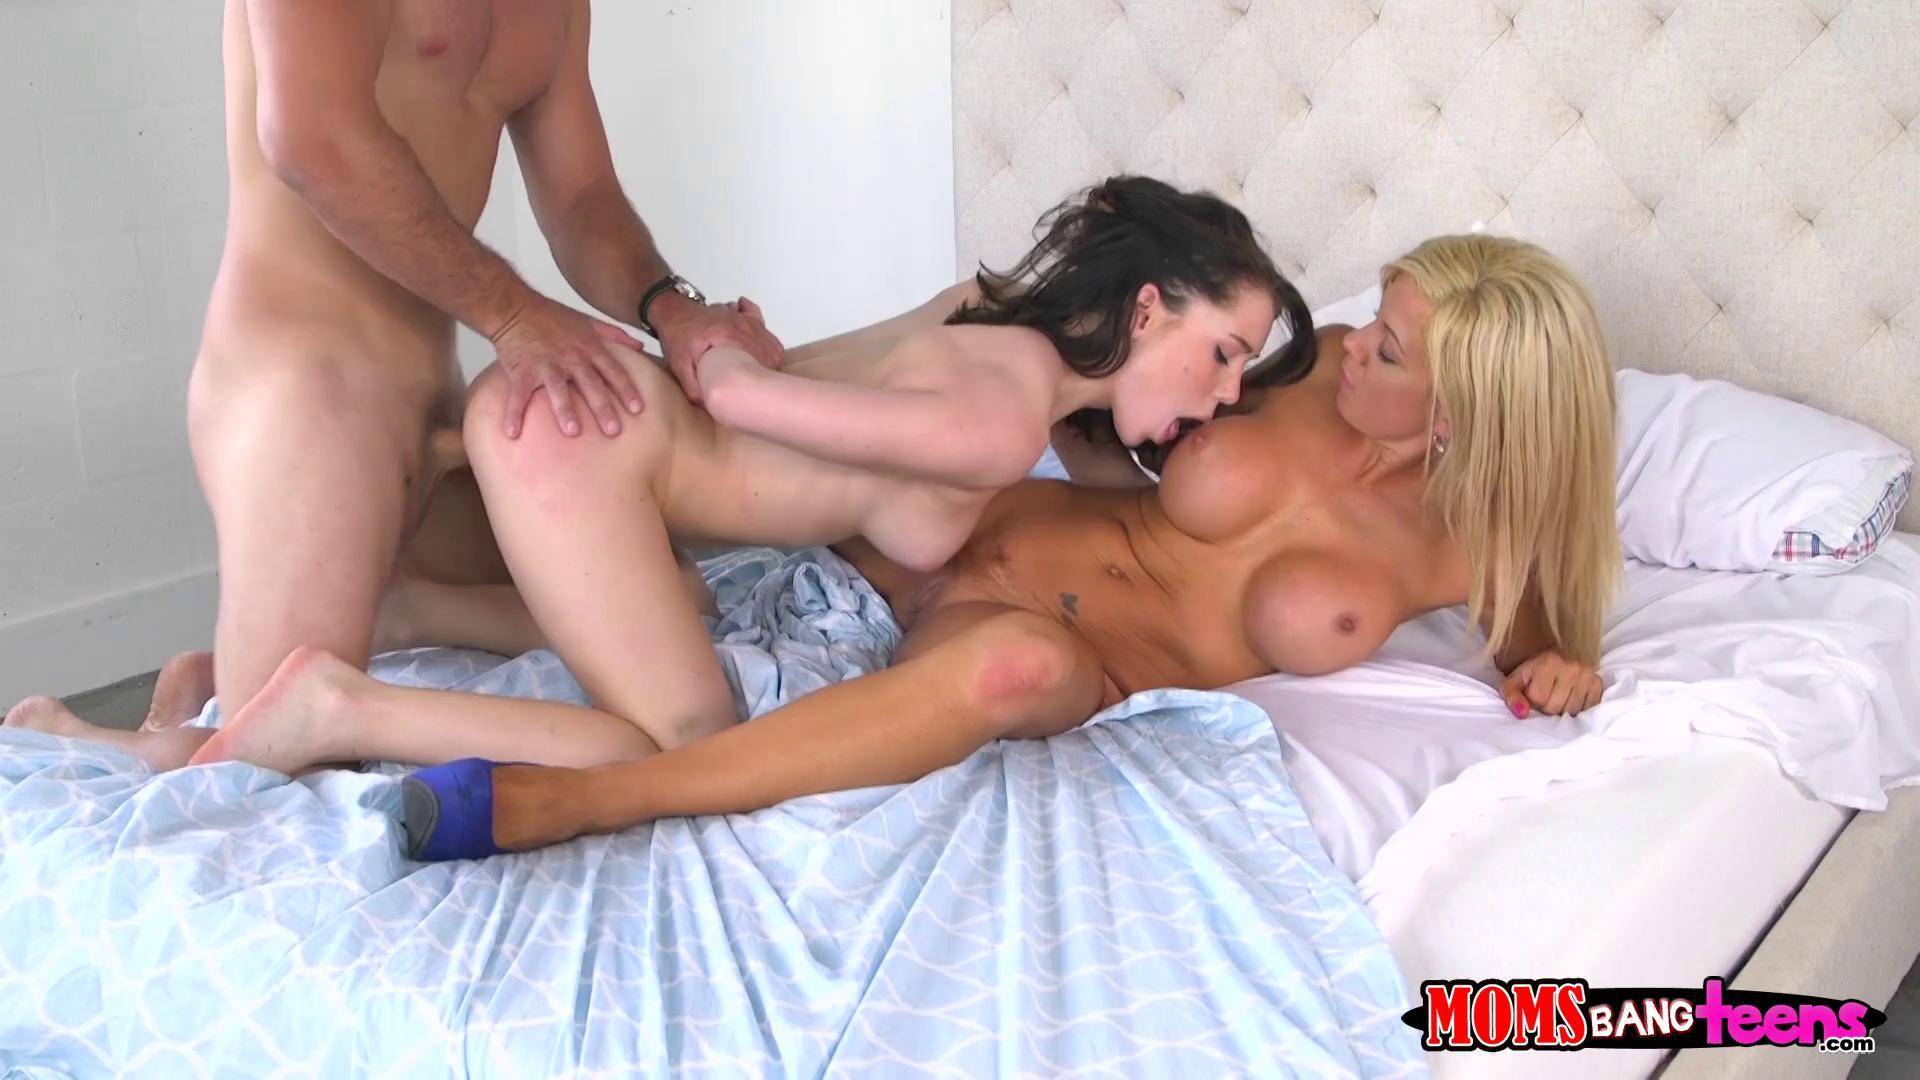 Milf Teen Masturbate Together